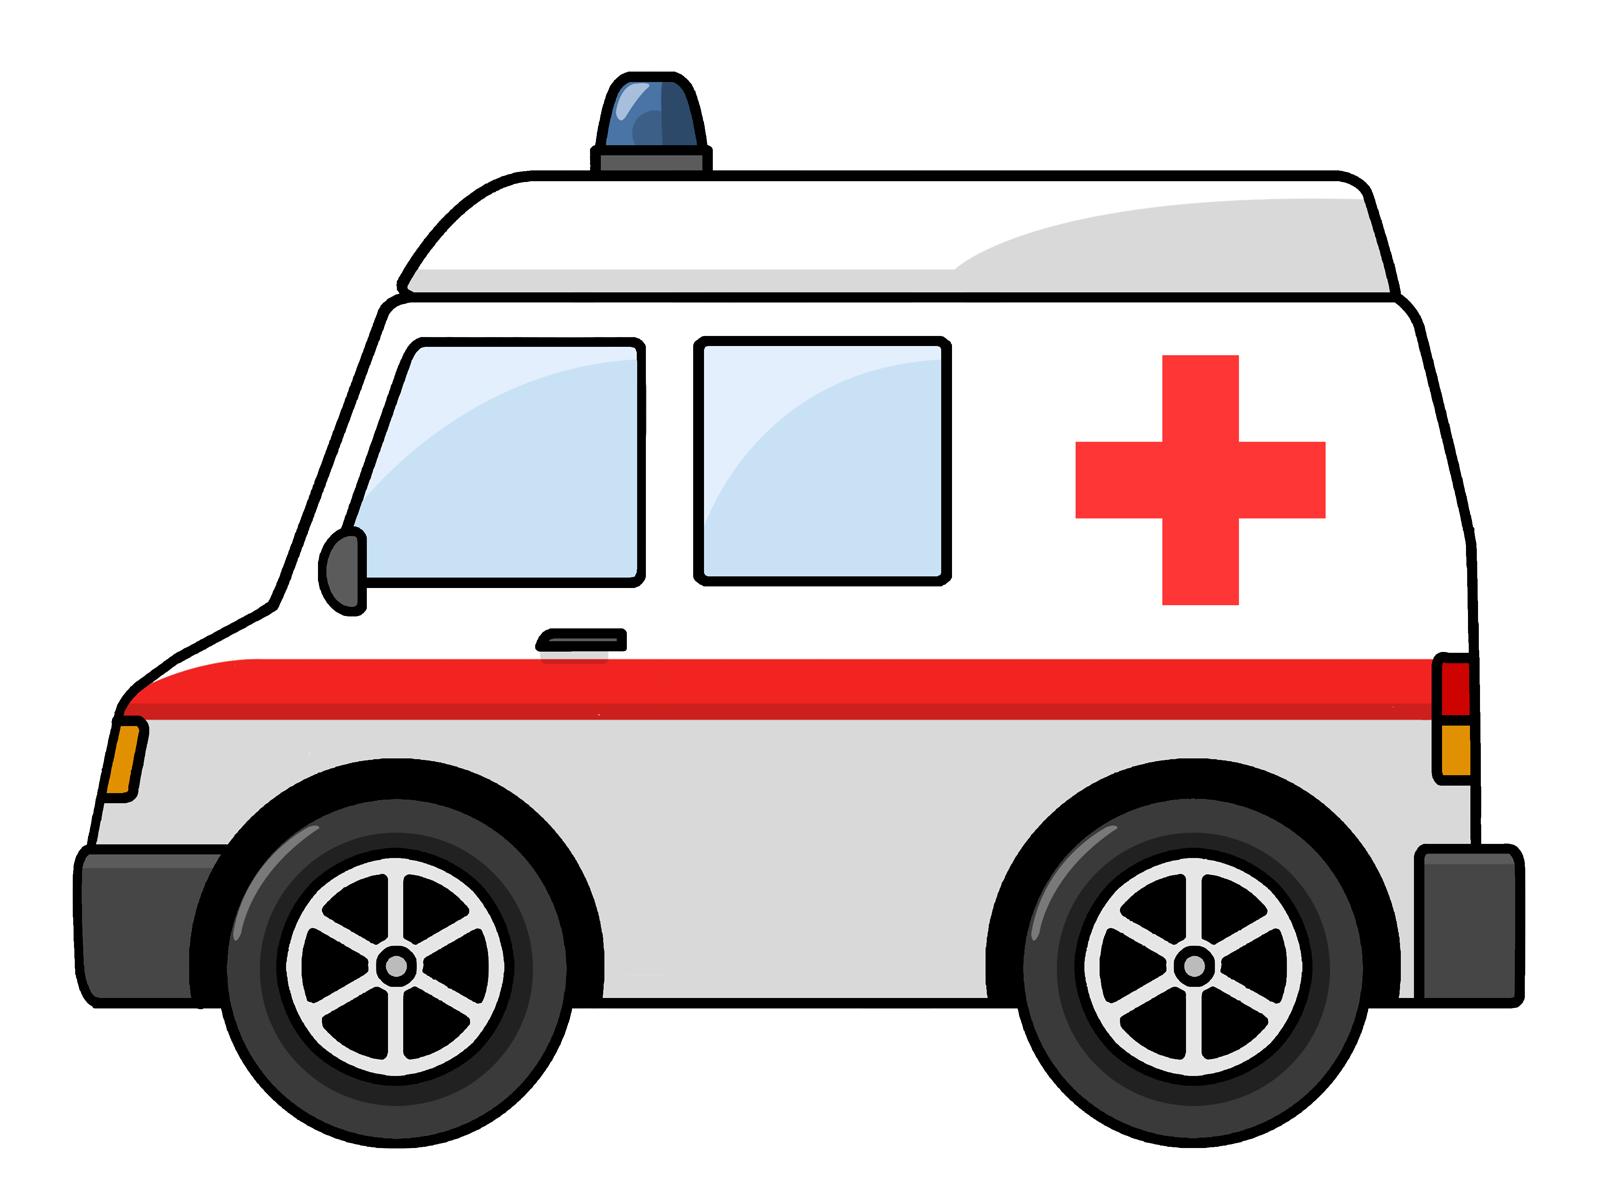 Free Cartoon Ambulance Clip Art-Free Cartoon Ambulance Clip Art-2